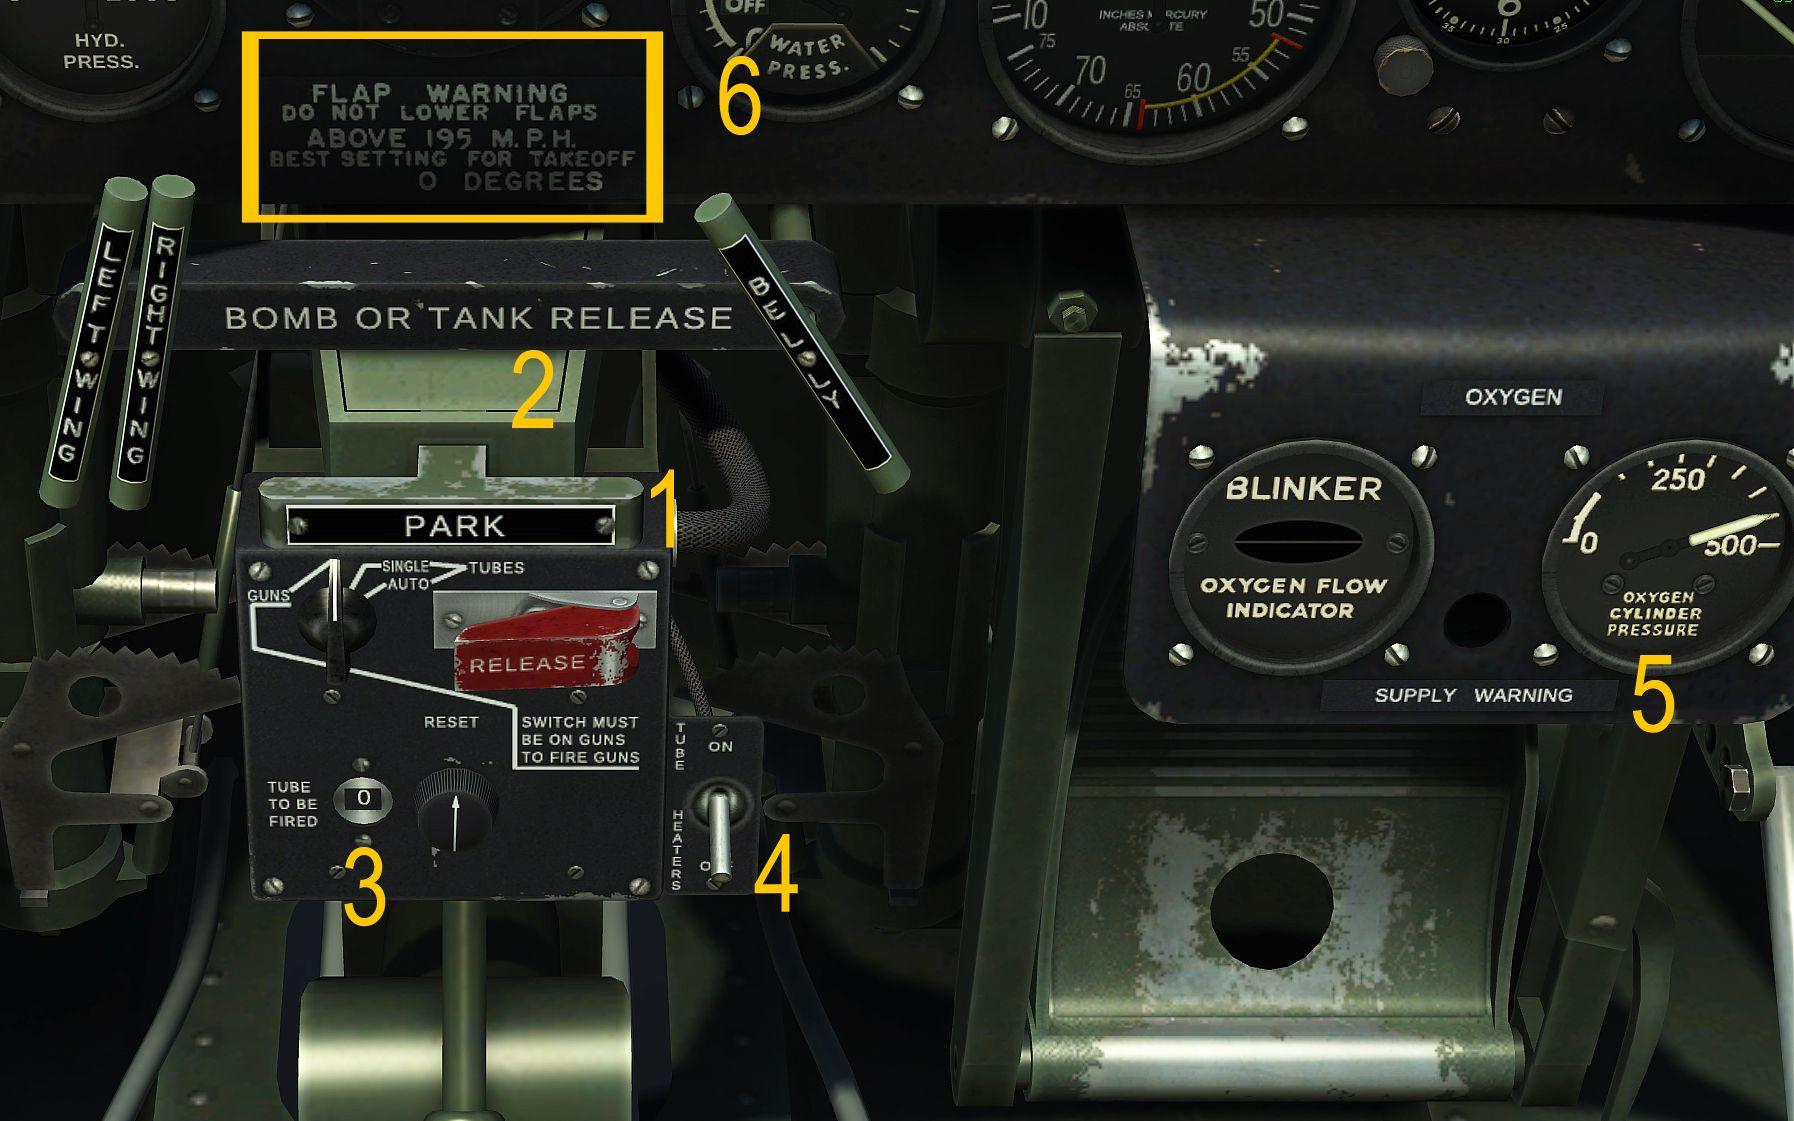 [FICHE] Republic P47-D-28-RE 5bdabcd188a54